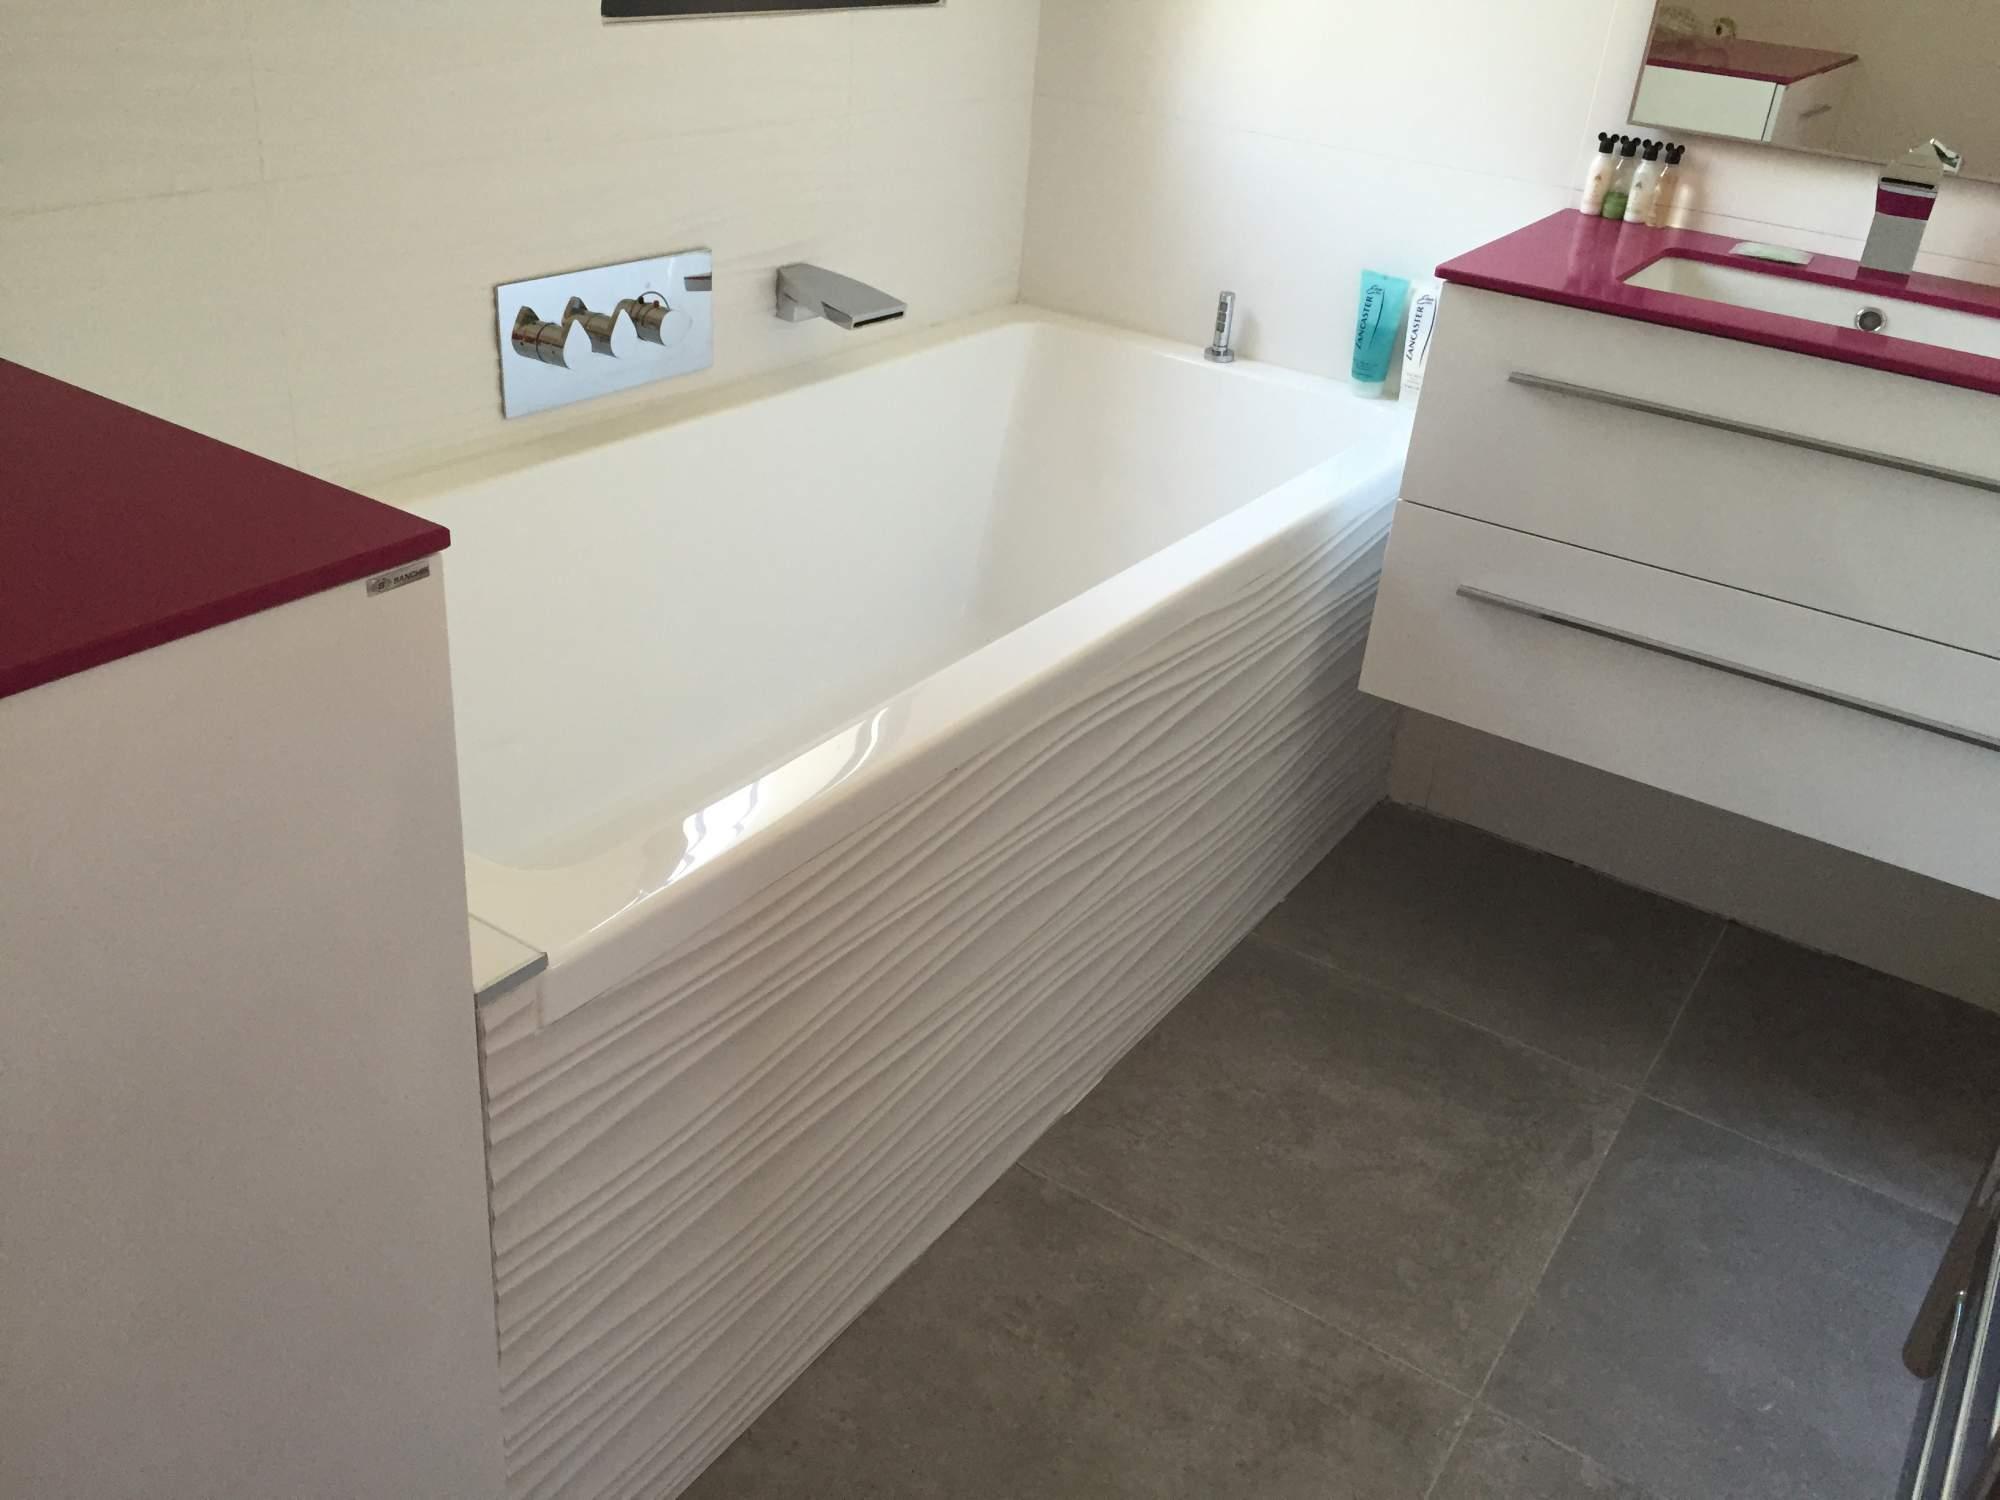 Carrelage salle de bain sol for Pose de carrelage salle de bain